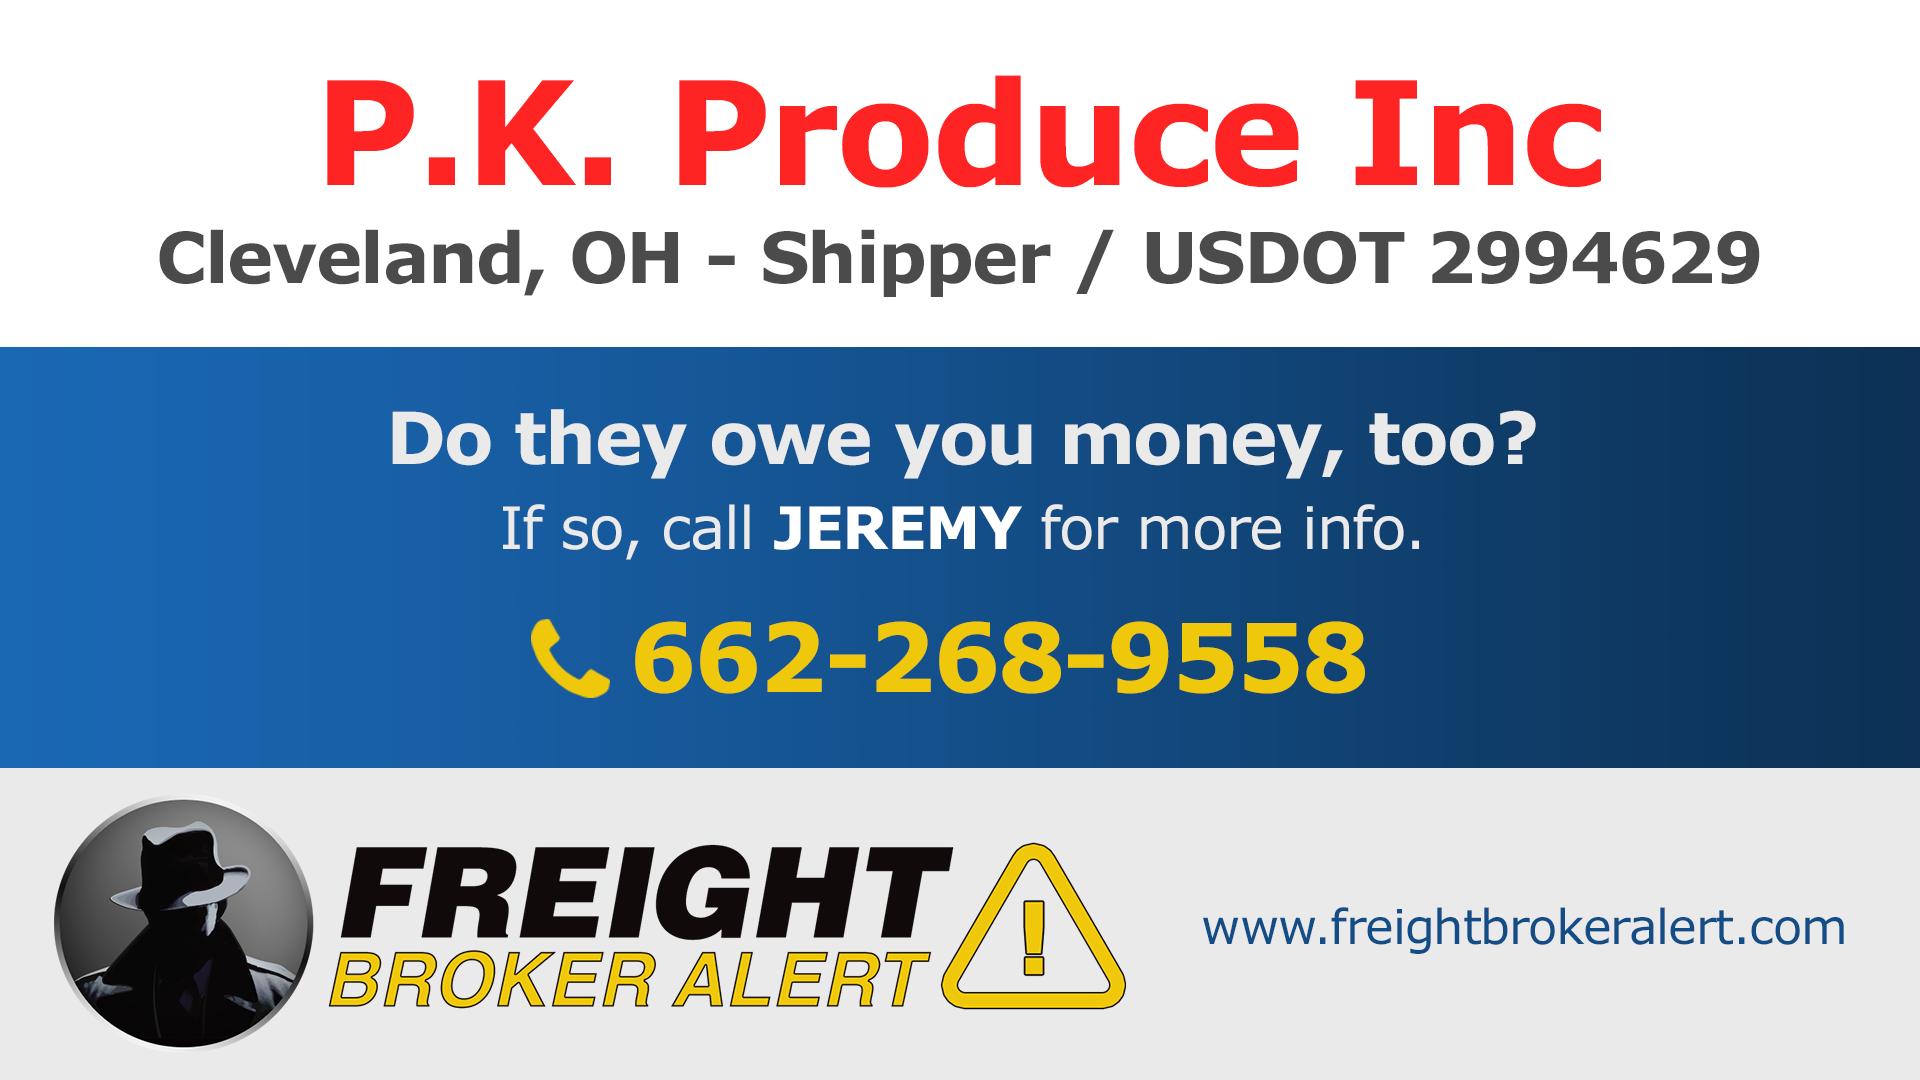 PK Produce Inc Ohio